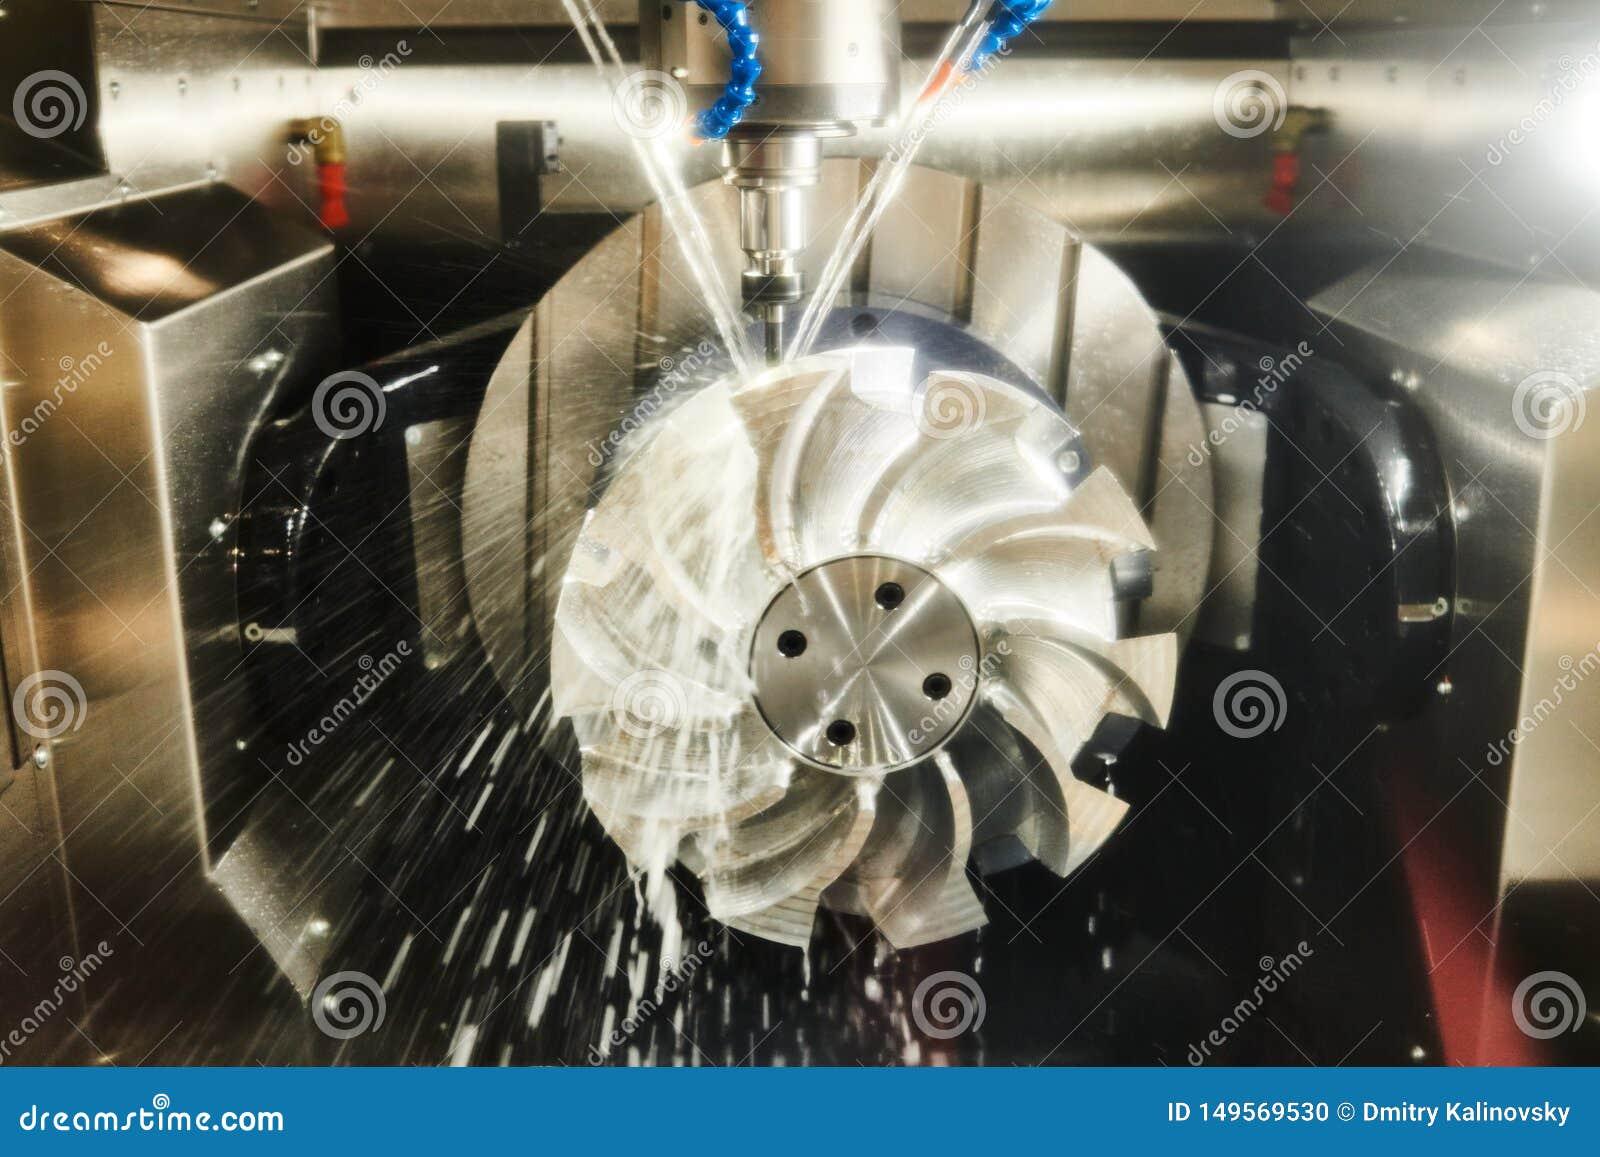 CNC εργασία μηχανών άλεσης Ψυκτικό μέσο και λίπανση στη βιομηχανία σιδηρουργείου